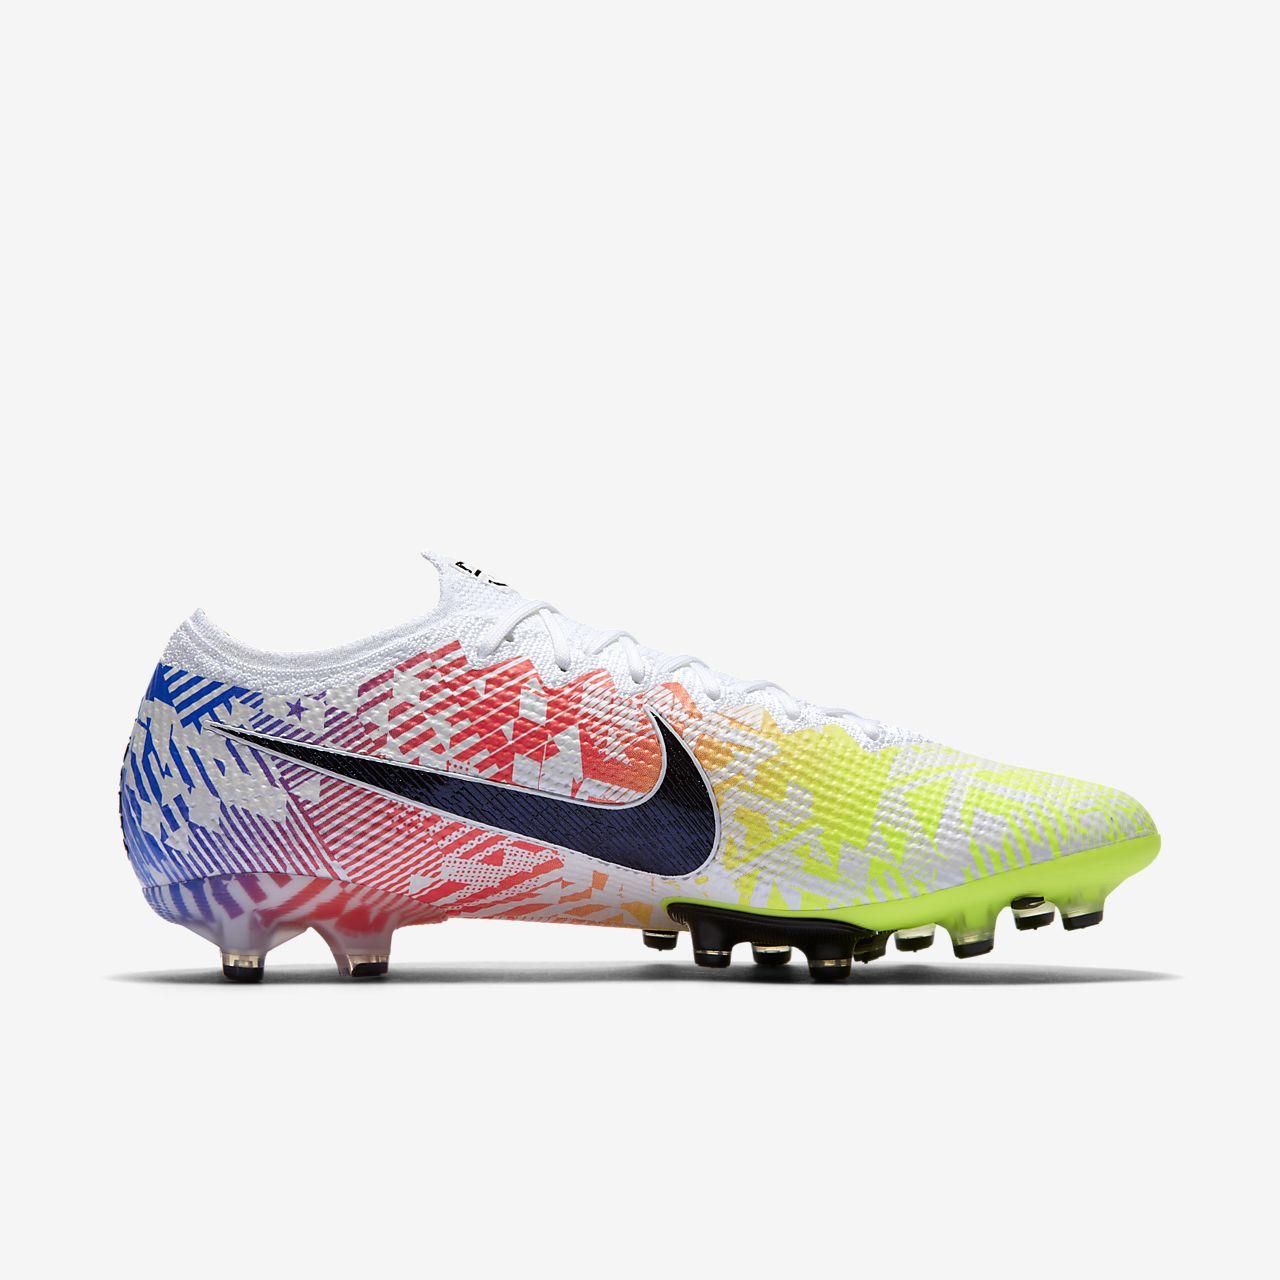 Nike Mercurial Vapor 13 Elite Neymar Jr. AG PRO Voetbalschoen (kunstgras)